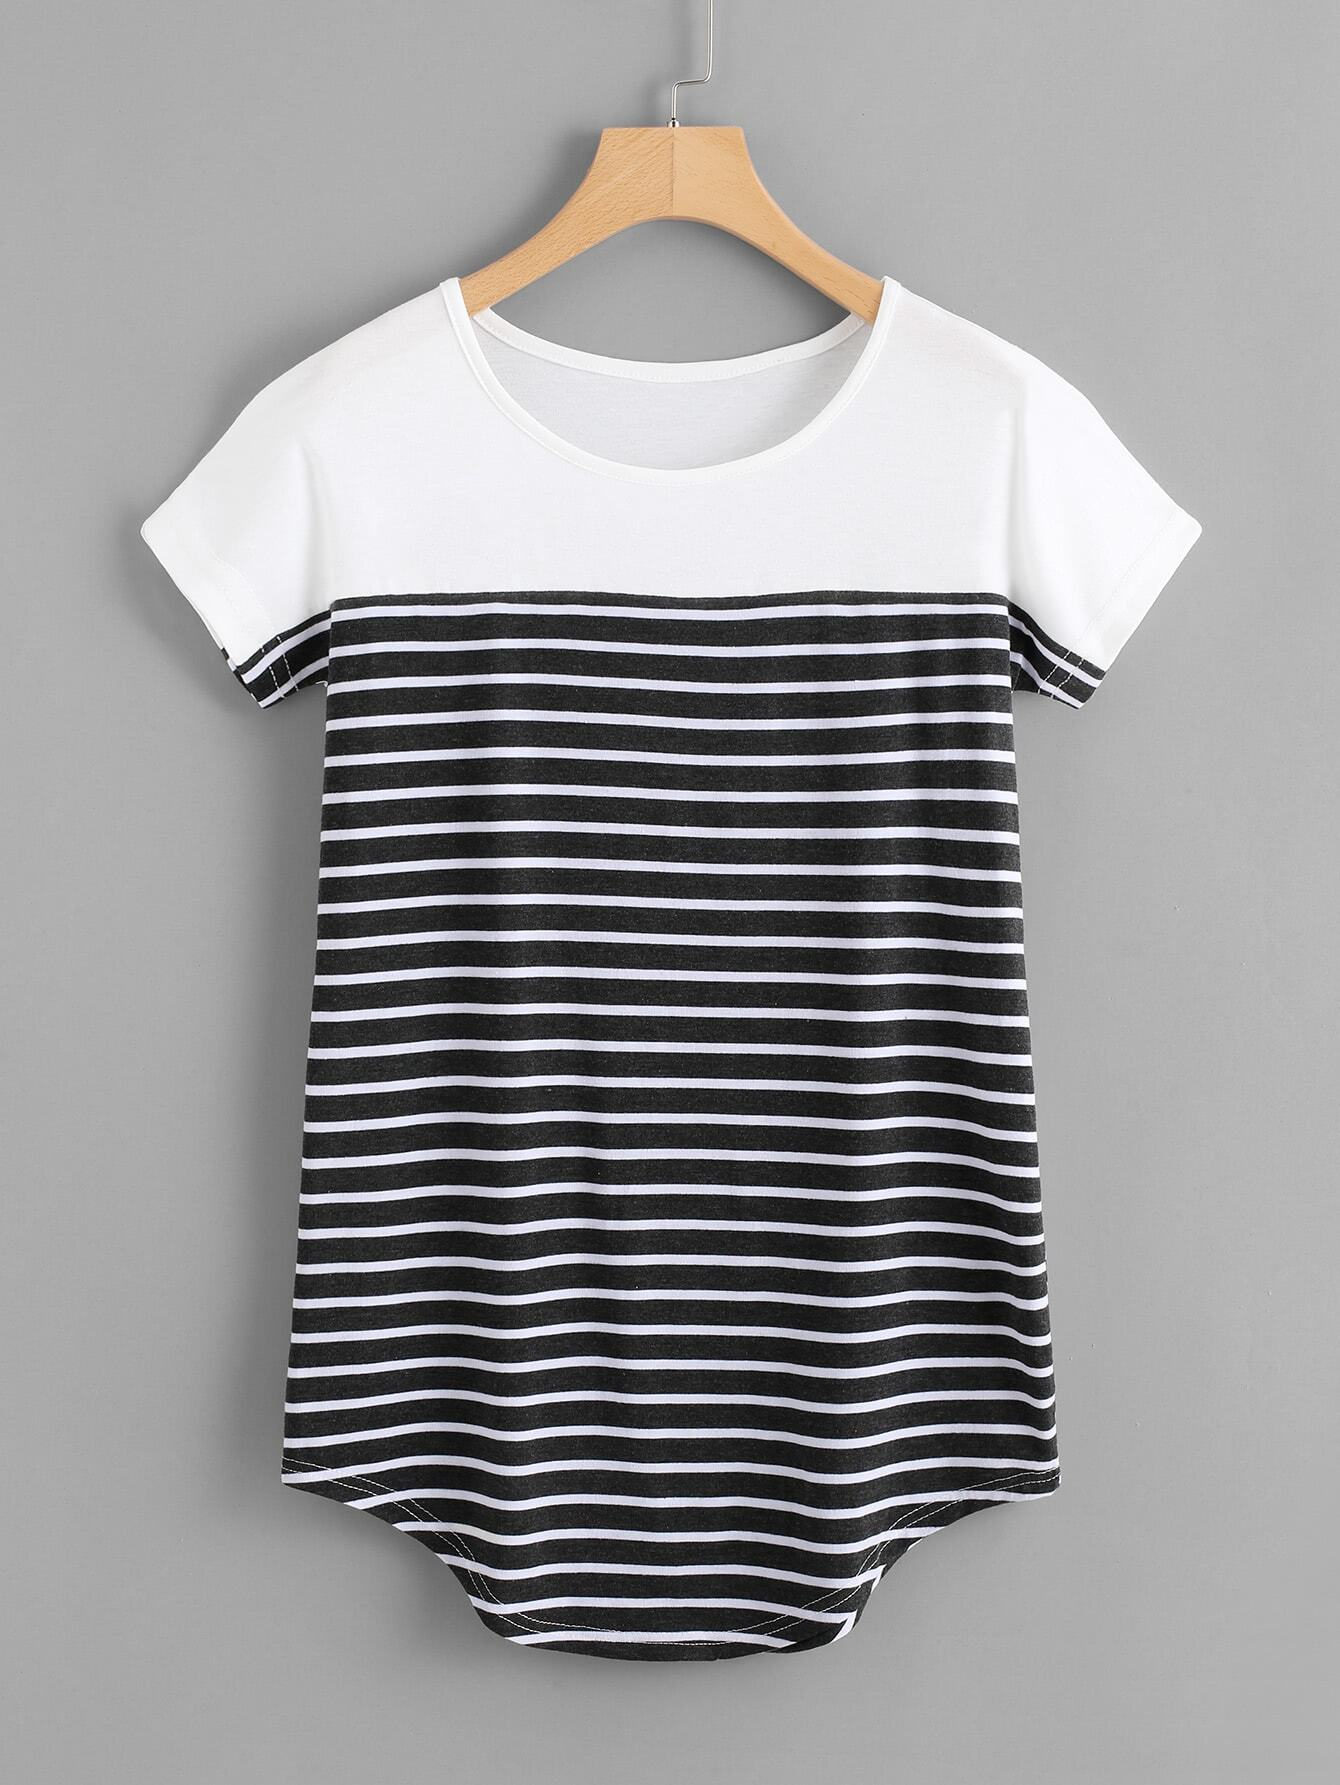 Striped Longline Tshirt striped longline tshirt